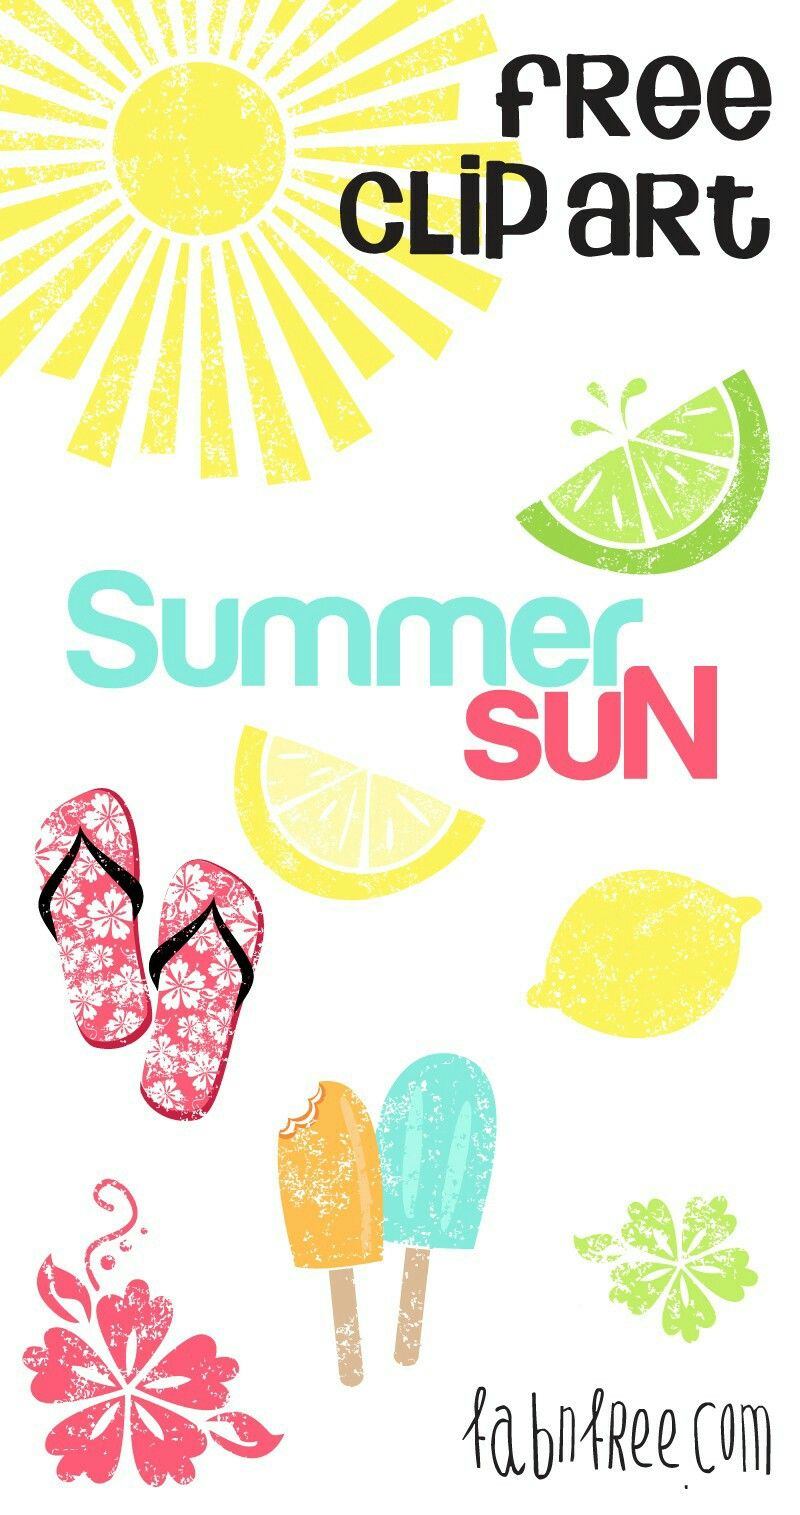 Pinleslie Cortinas On Jjc Birthday Parties | Pinterest | Sun - Free Printable Summer Clip Art